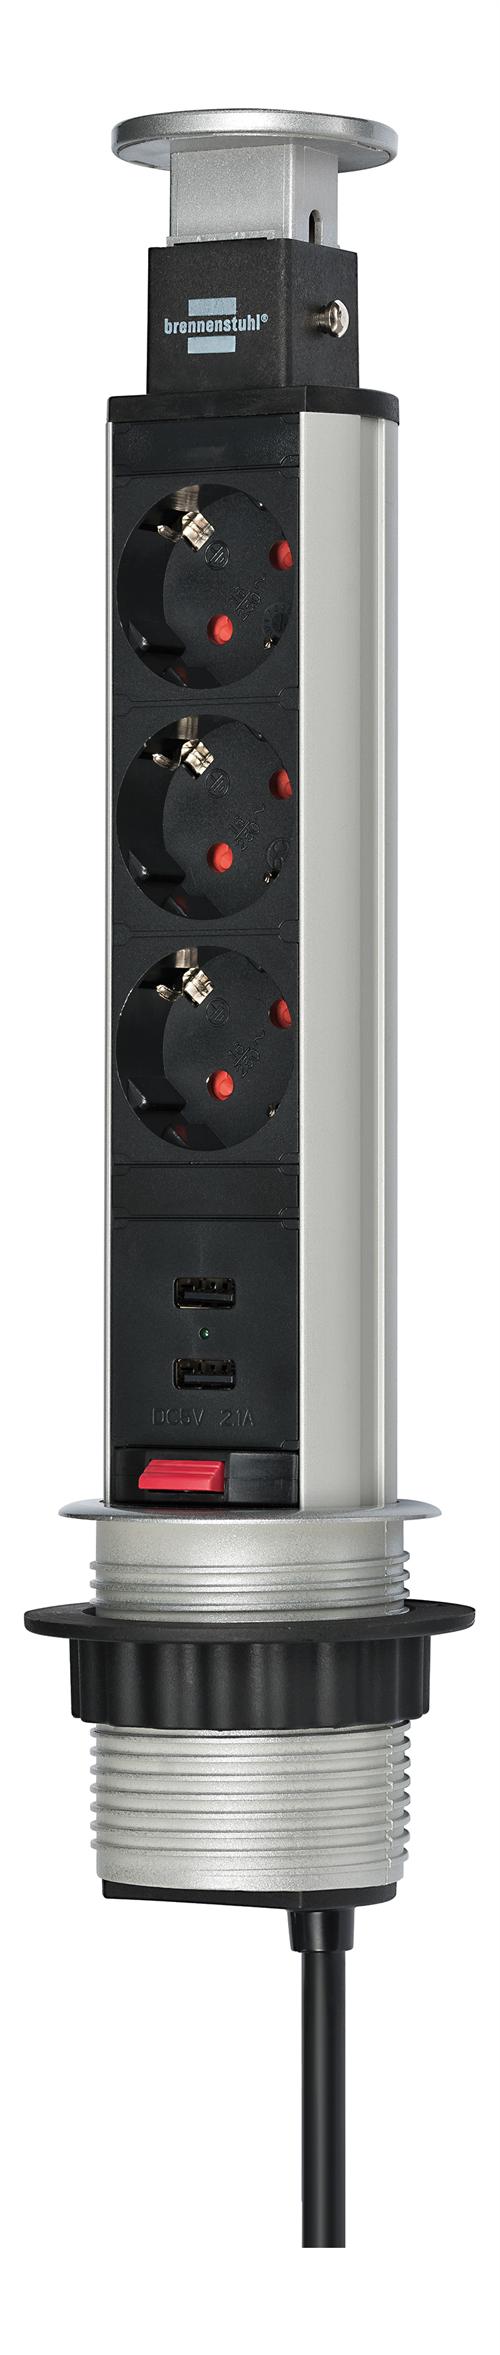 Image of Brennenstuhl Tower Power Pöytämalli 3 X CEE 7/4, 2 USB